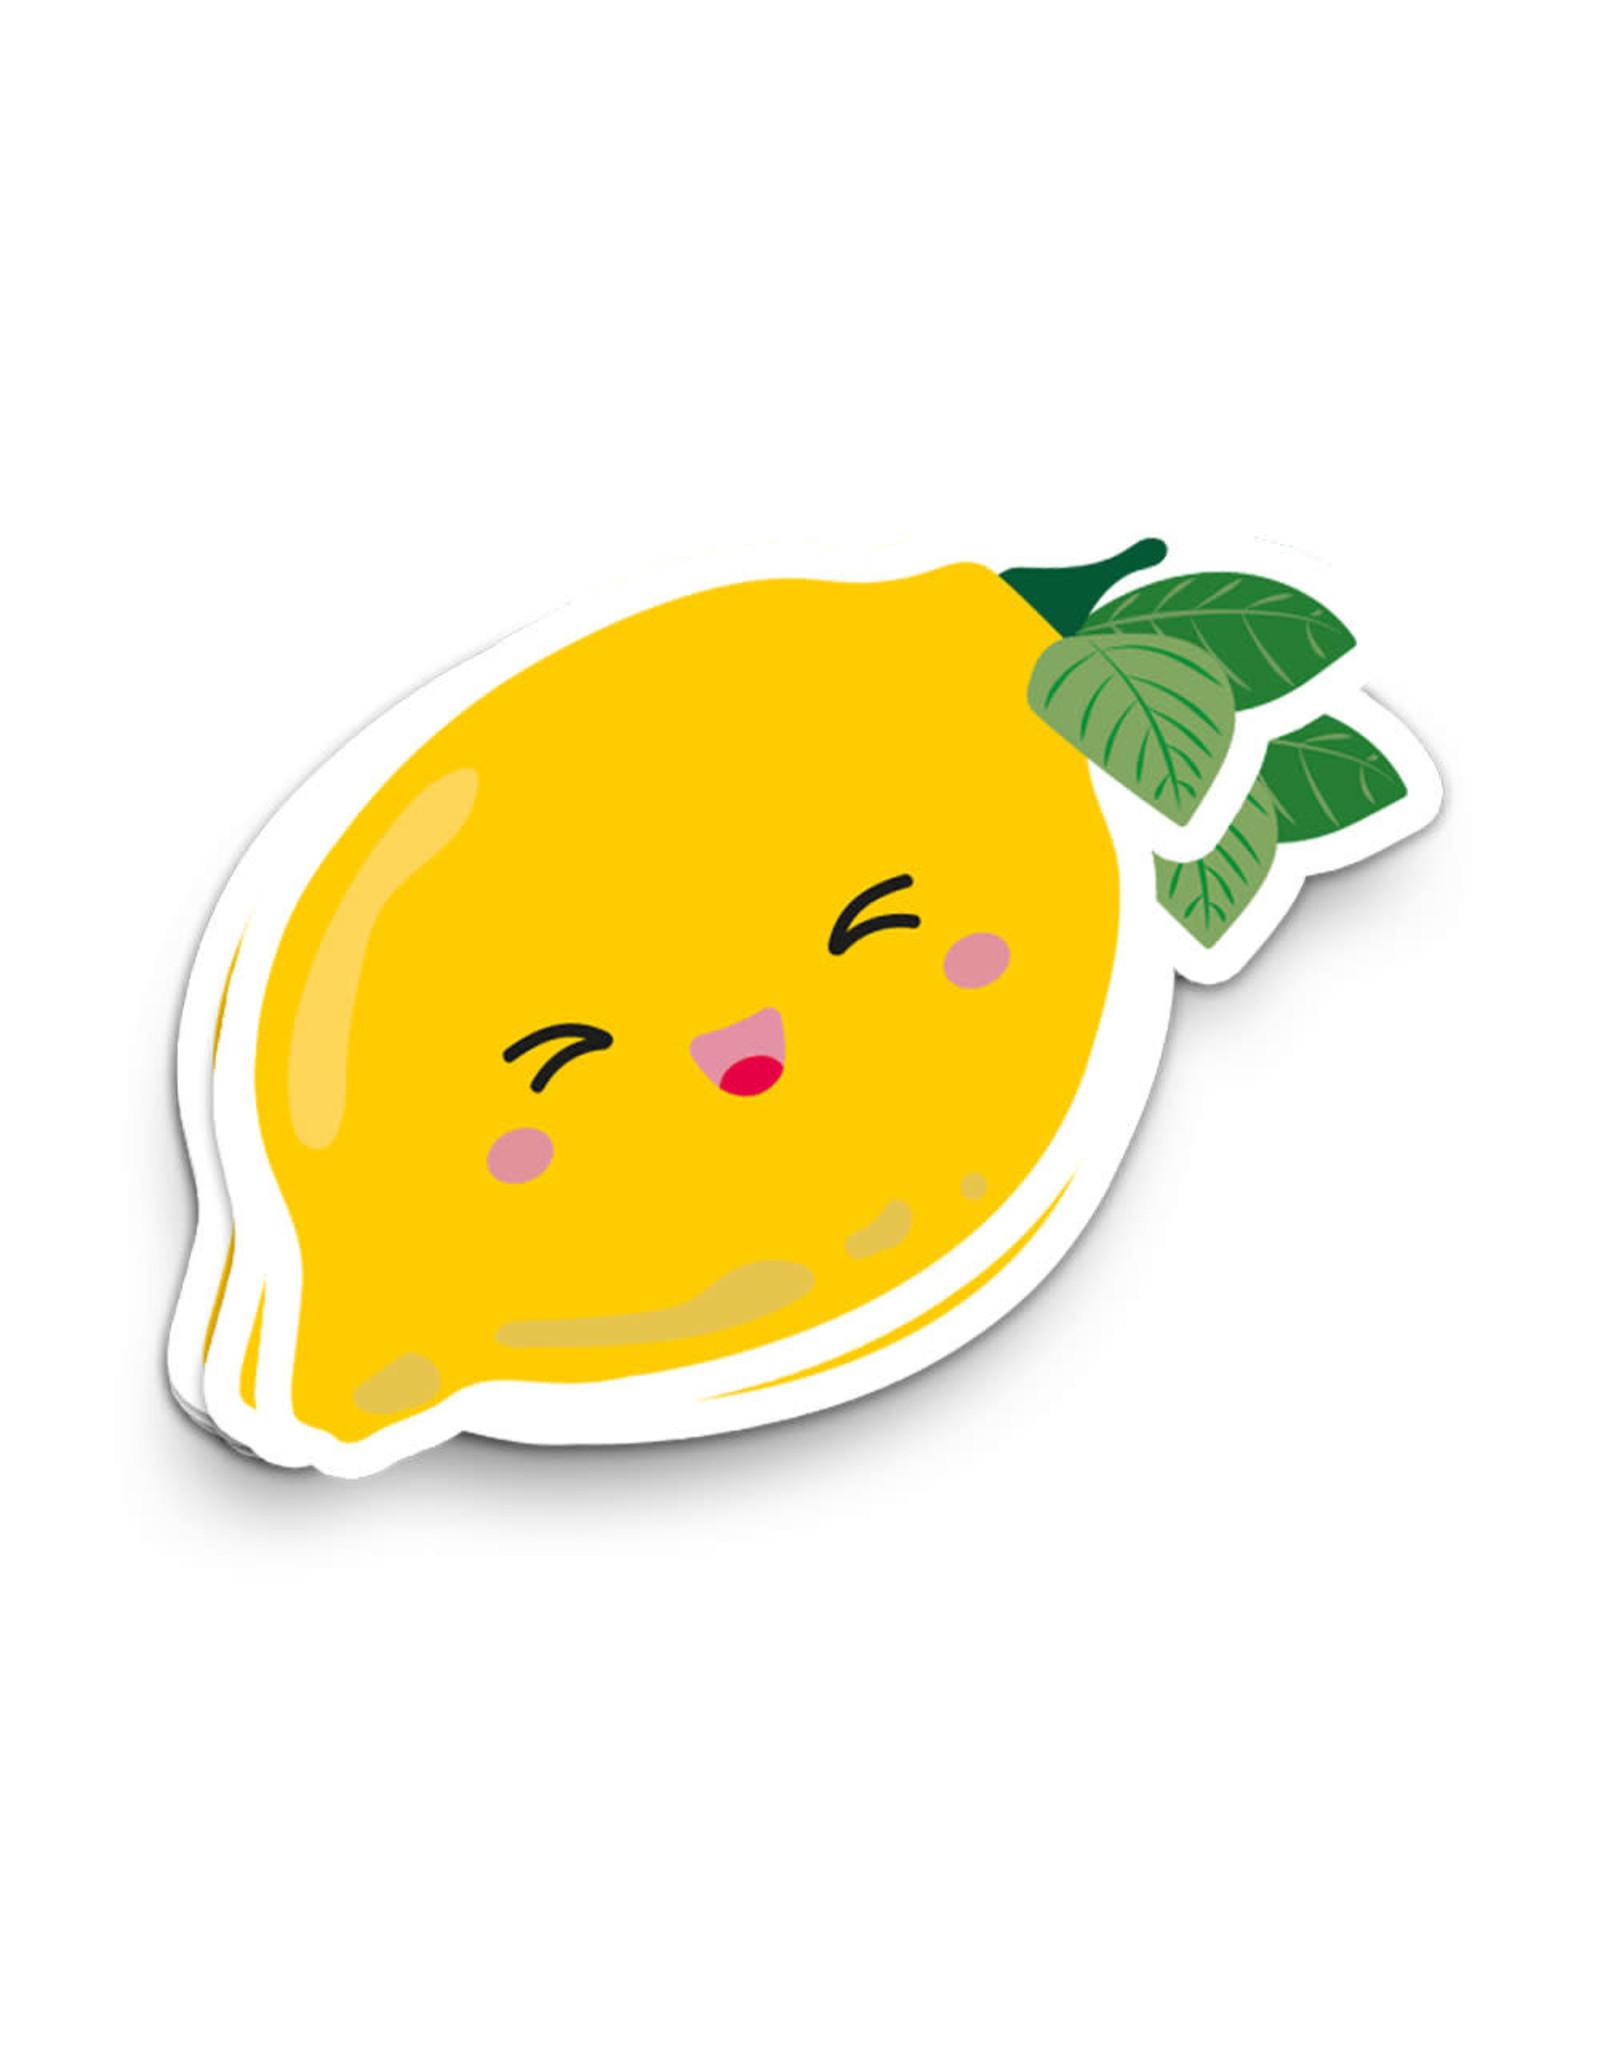 Sticker vinyl citroen